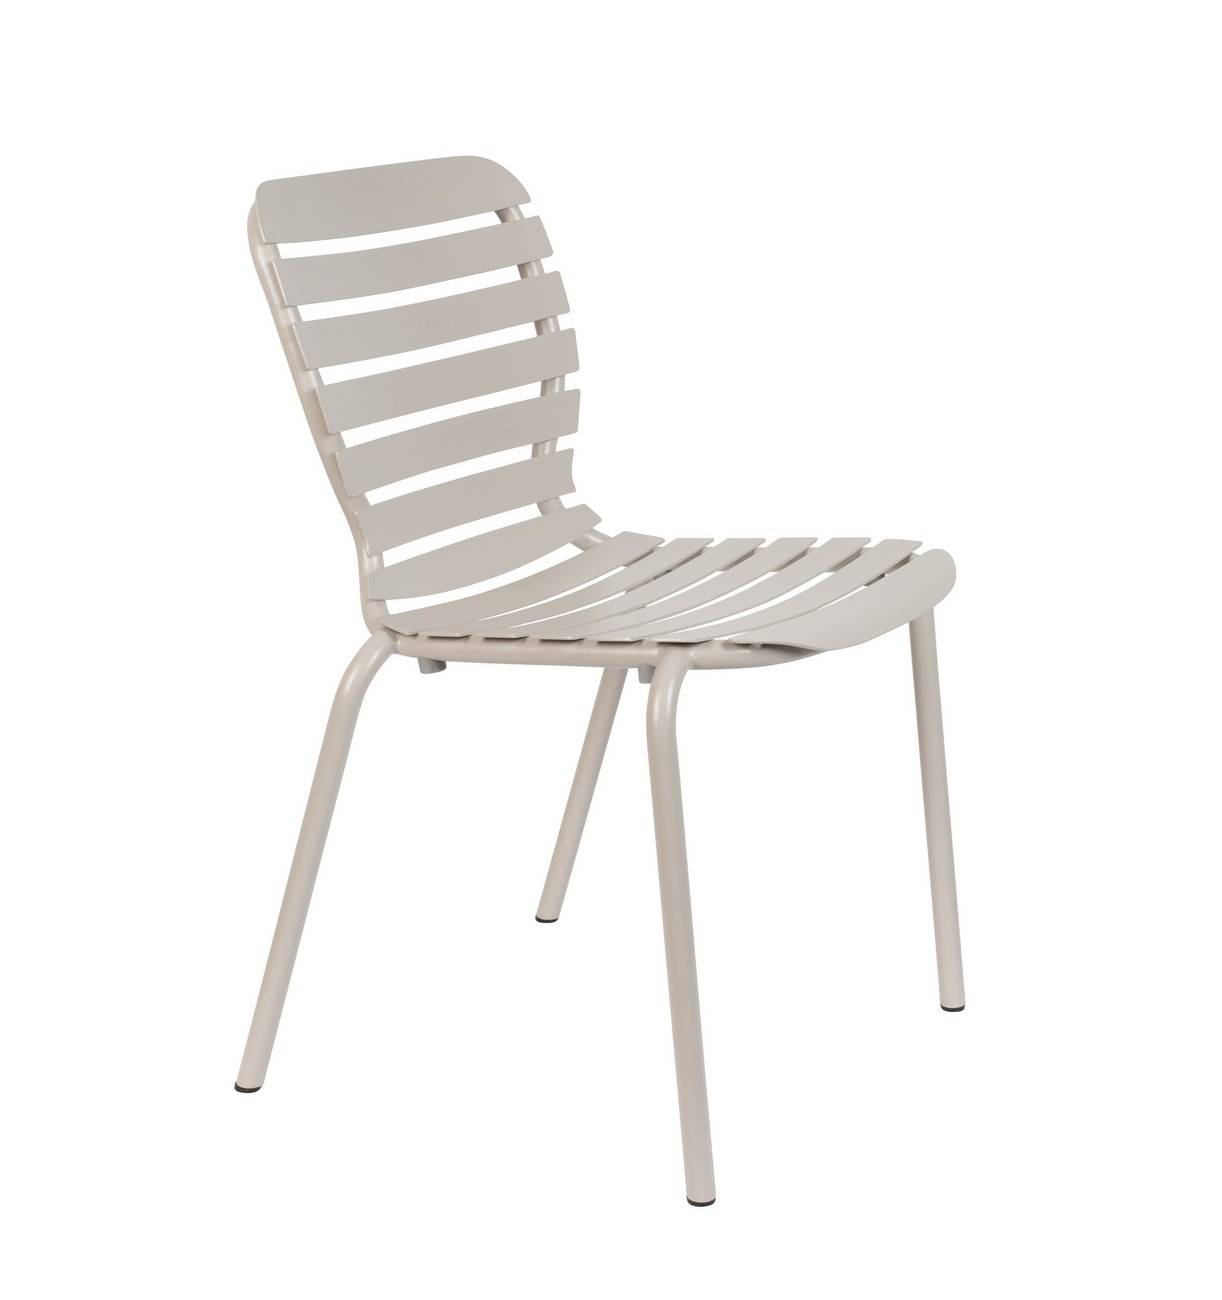 Zuiver Chaise de jardin en aluminium Argile